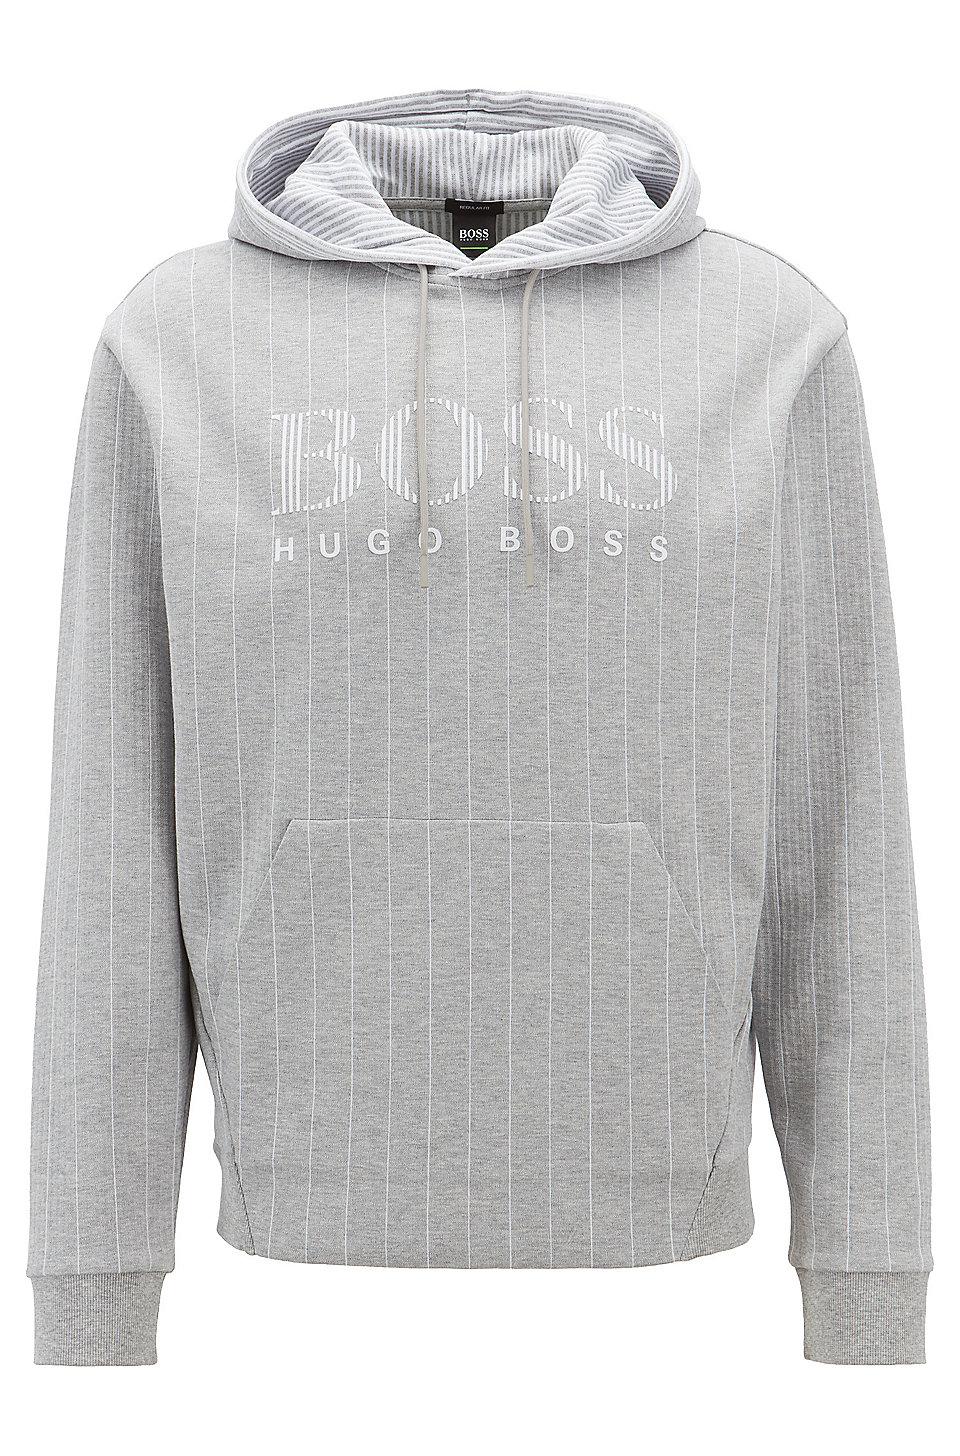 092dfc8203f4 BOSS - Hooded pinstripe sweatshirt in cotton with flock-print logo